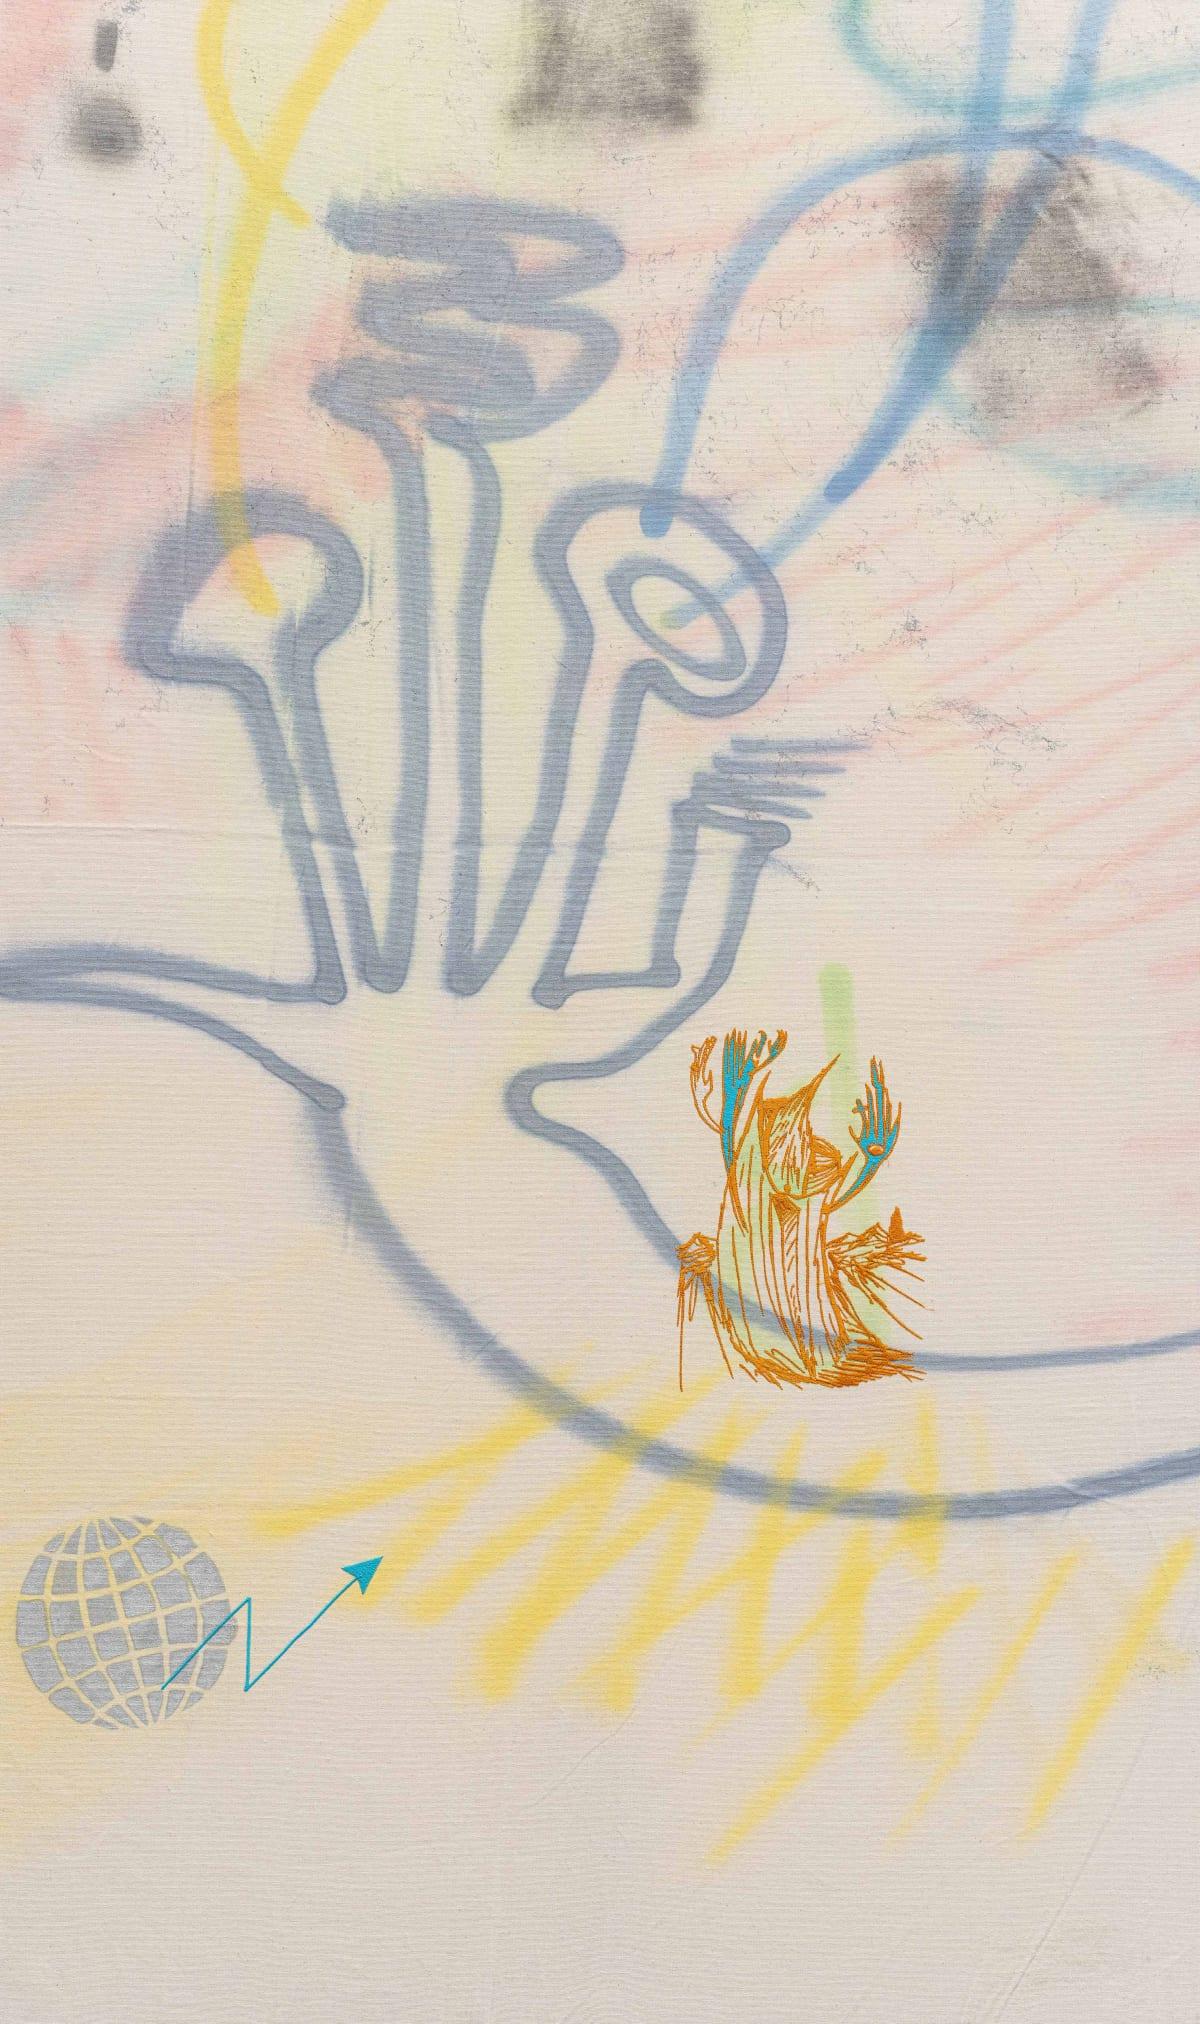 Niko Abramidis & NE Anamorphic Growth, 2018 canvas, spraypaint, embroidery 155 x 92 x 5 cm 61 1/8 x 36...